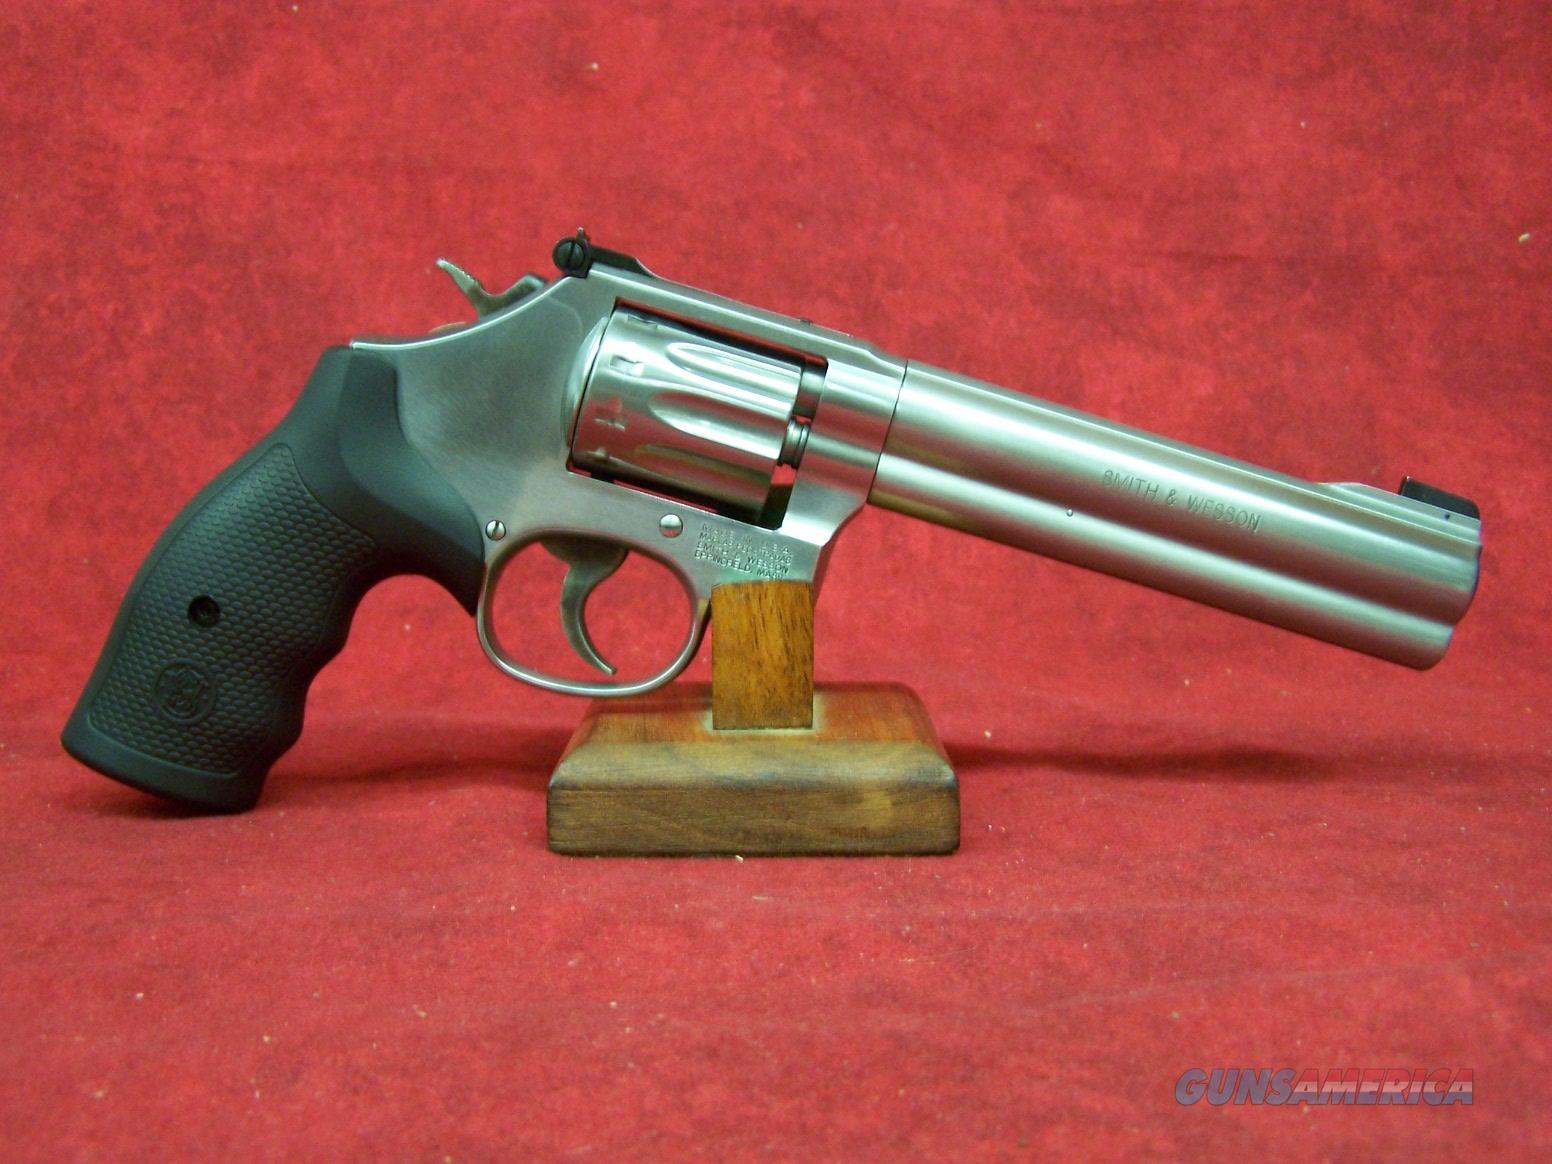 "Smith & Wesson 617 K-22 Masterpiece 6"" 10 shot (160578)  Guns > Pistols > Smith & Wesson Revolvers > Full Frame Revolver"